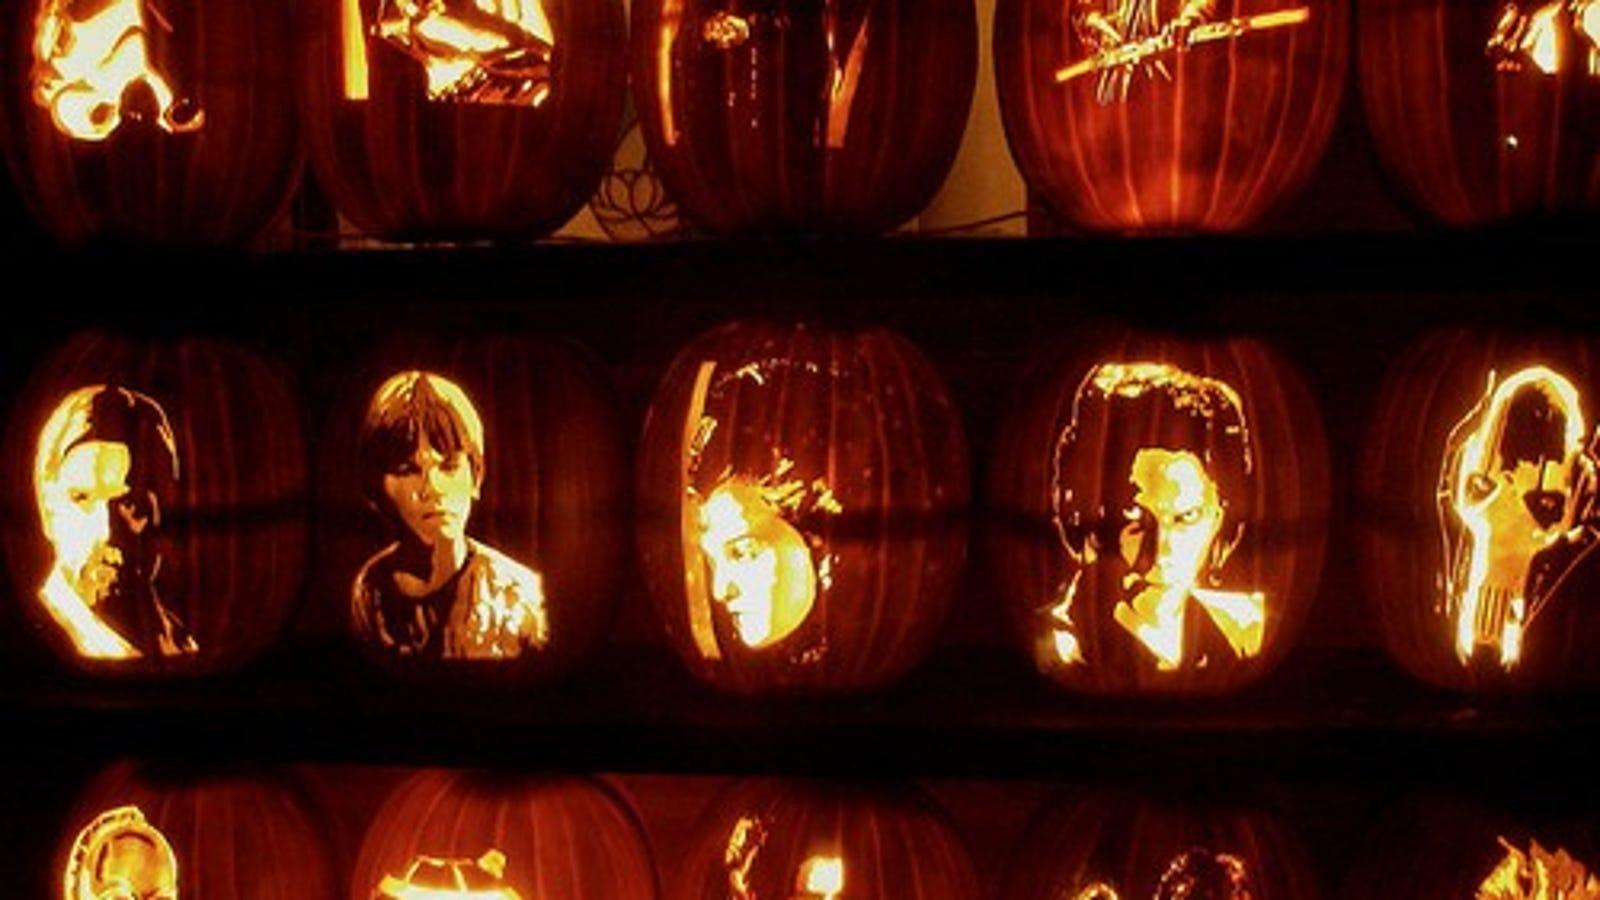 Carve and preserve the ultimate pumpkin